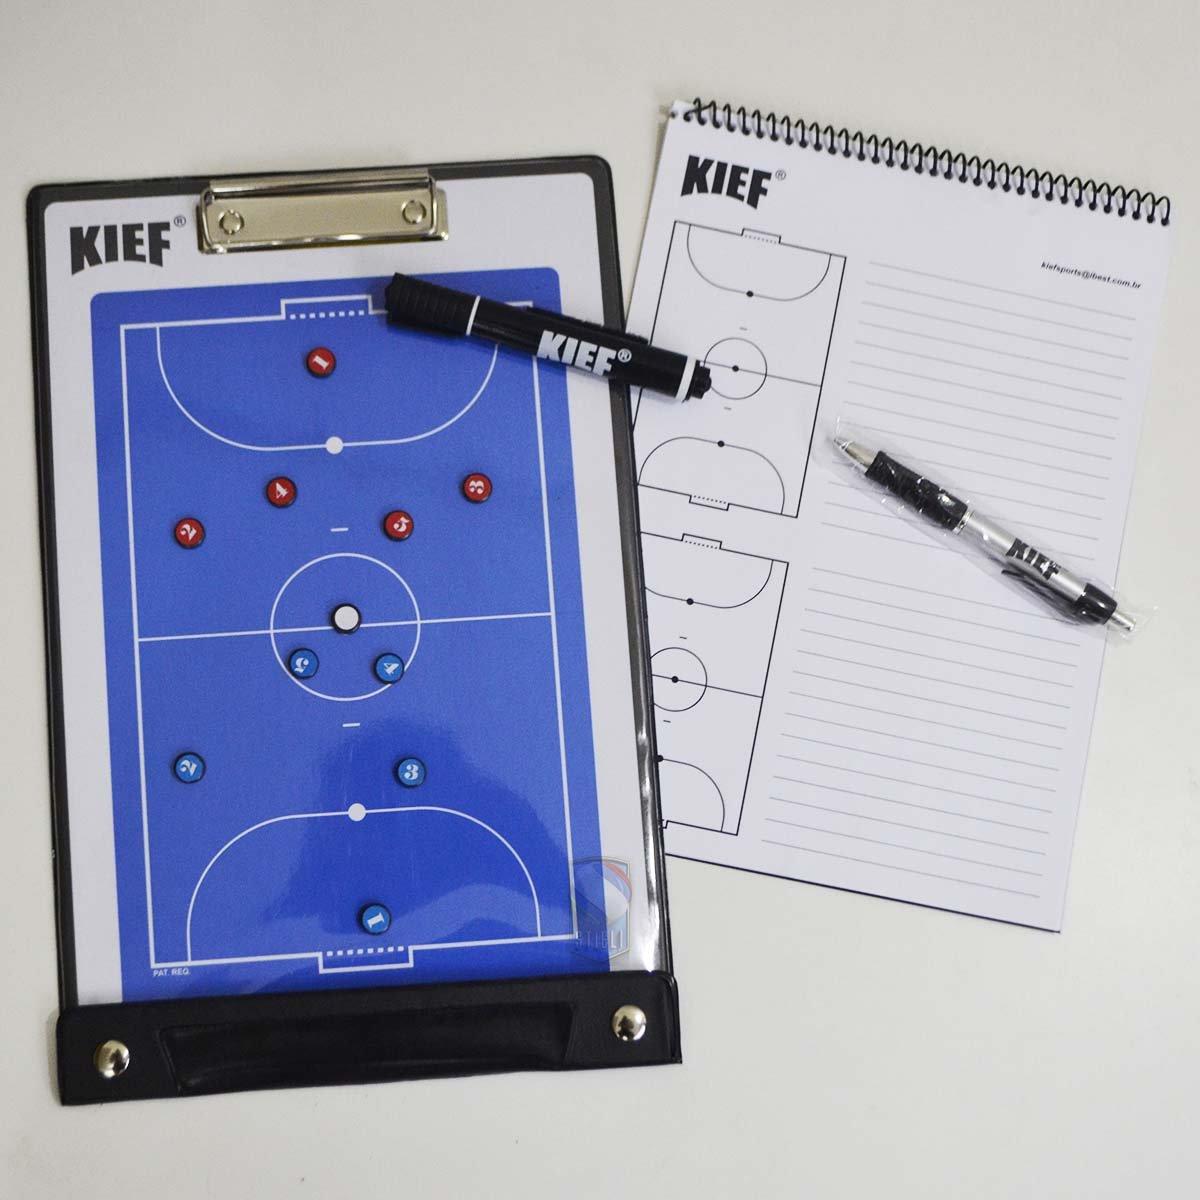 Pasta Com Prancheta Tática Magnética Futsal Kief - Branco - Compre ... 3d2ed3d31e84c